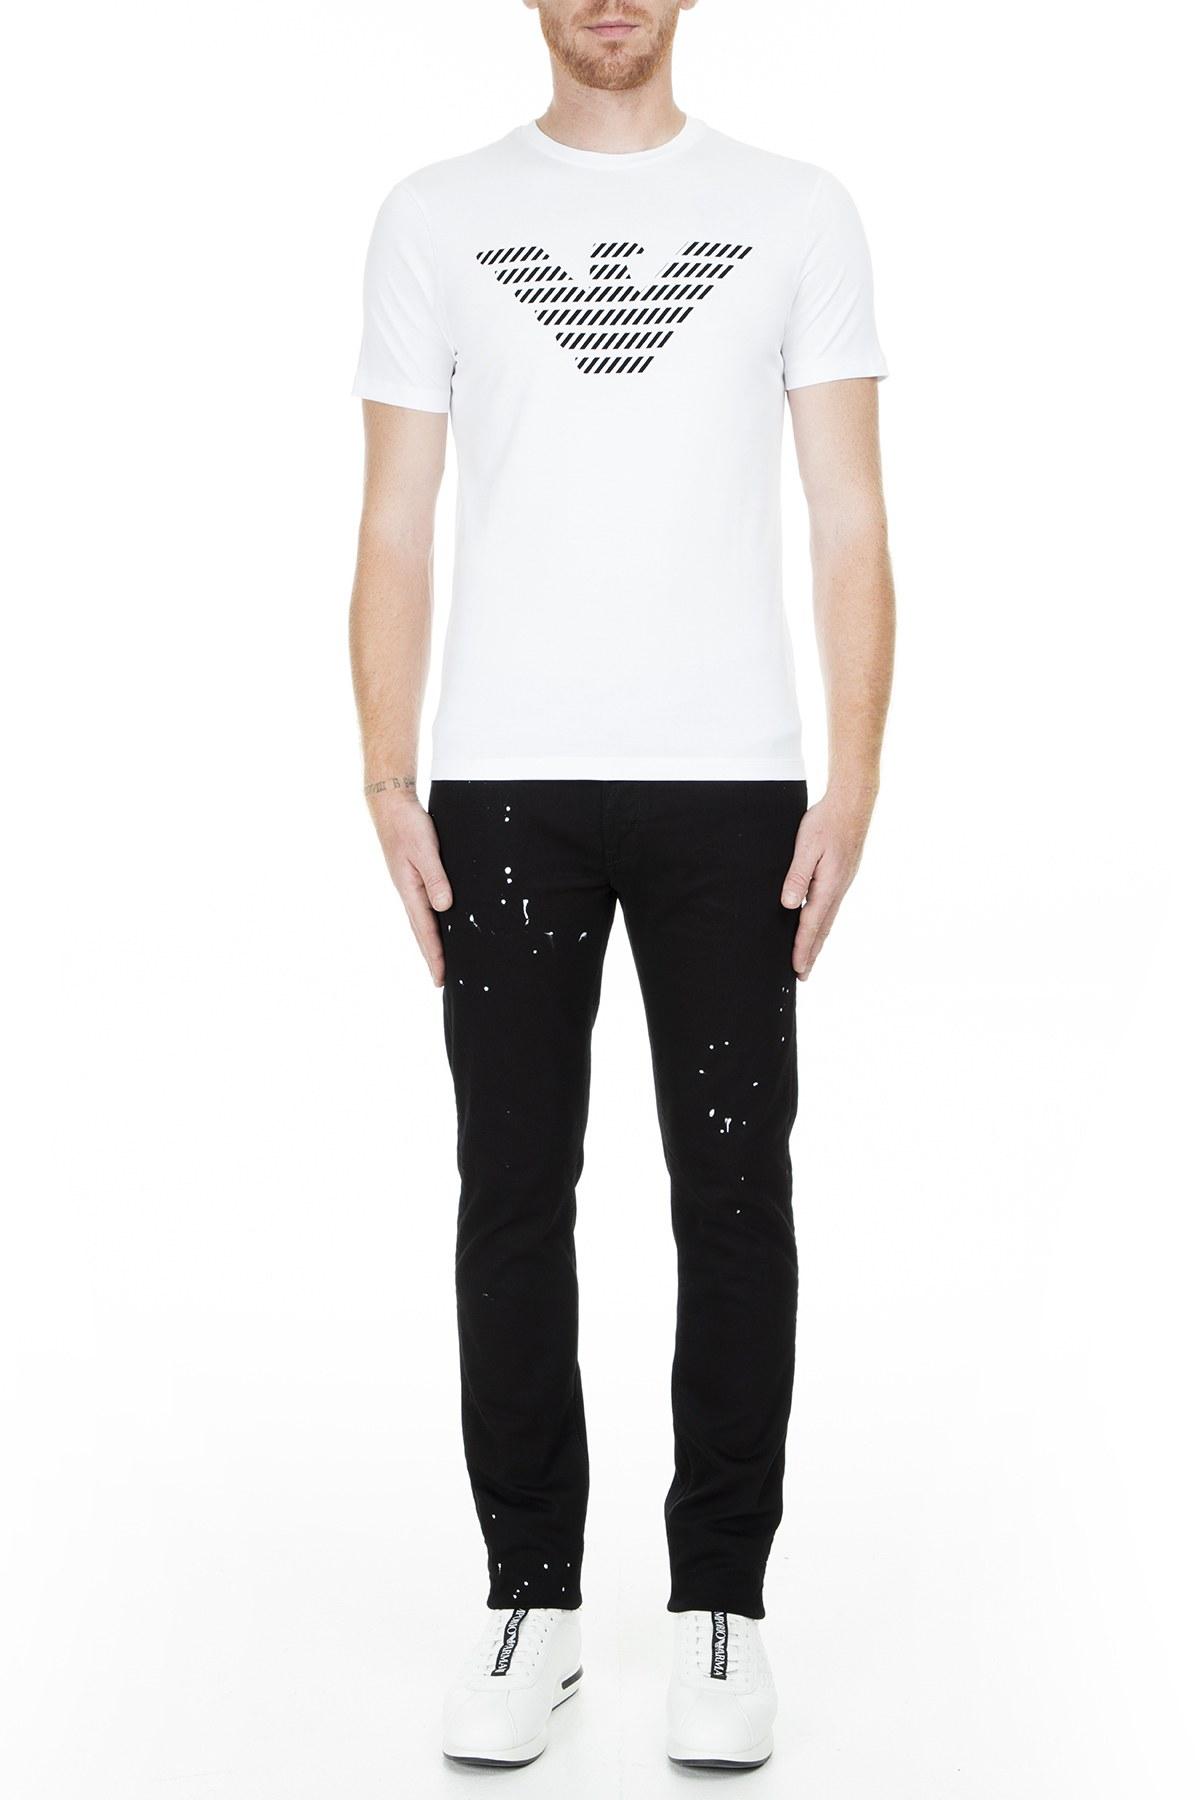 Emporio Armani Erkek T Shirt S 3G1T94 1J30Z 0100 BEYAZ